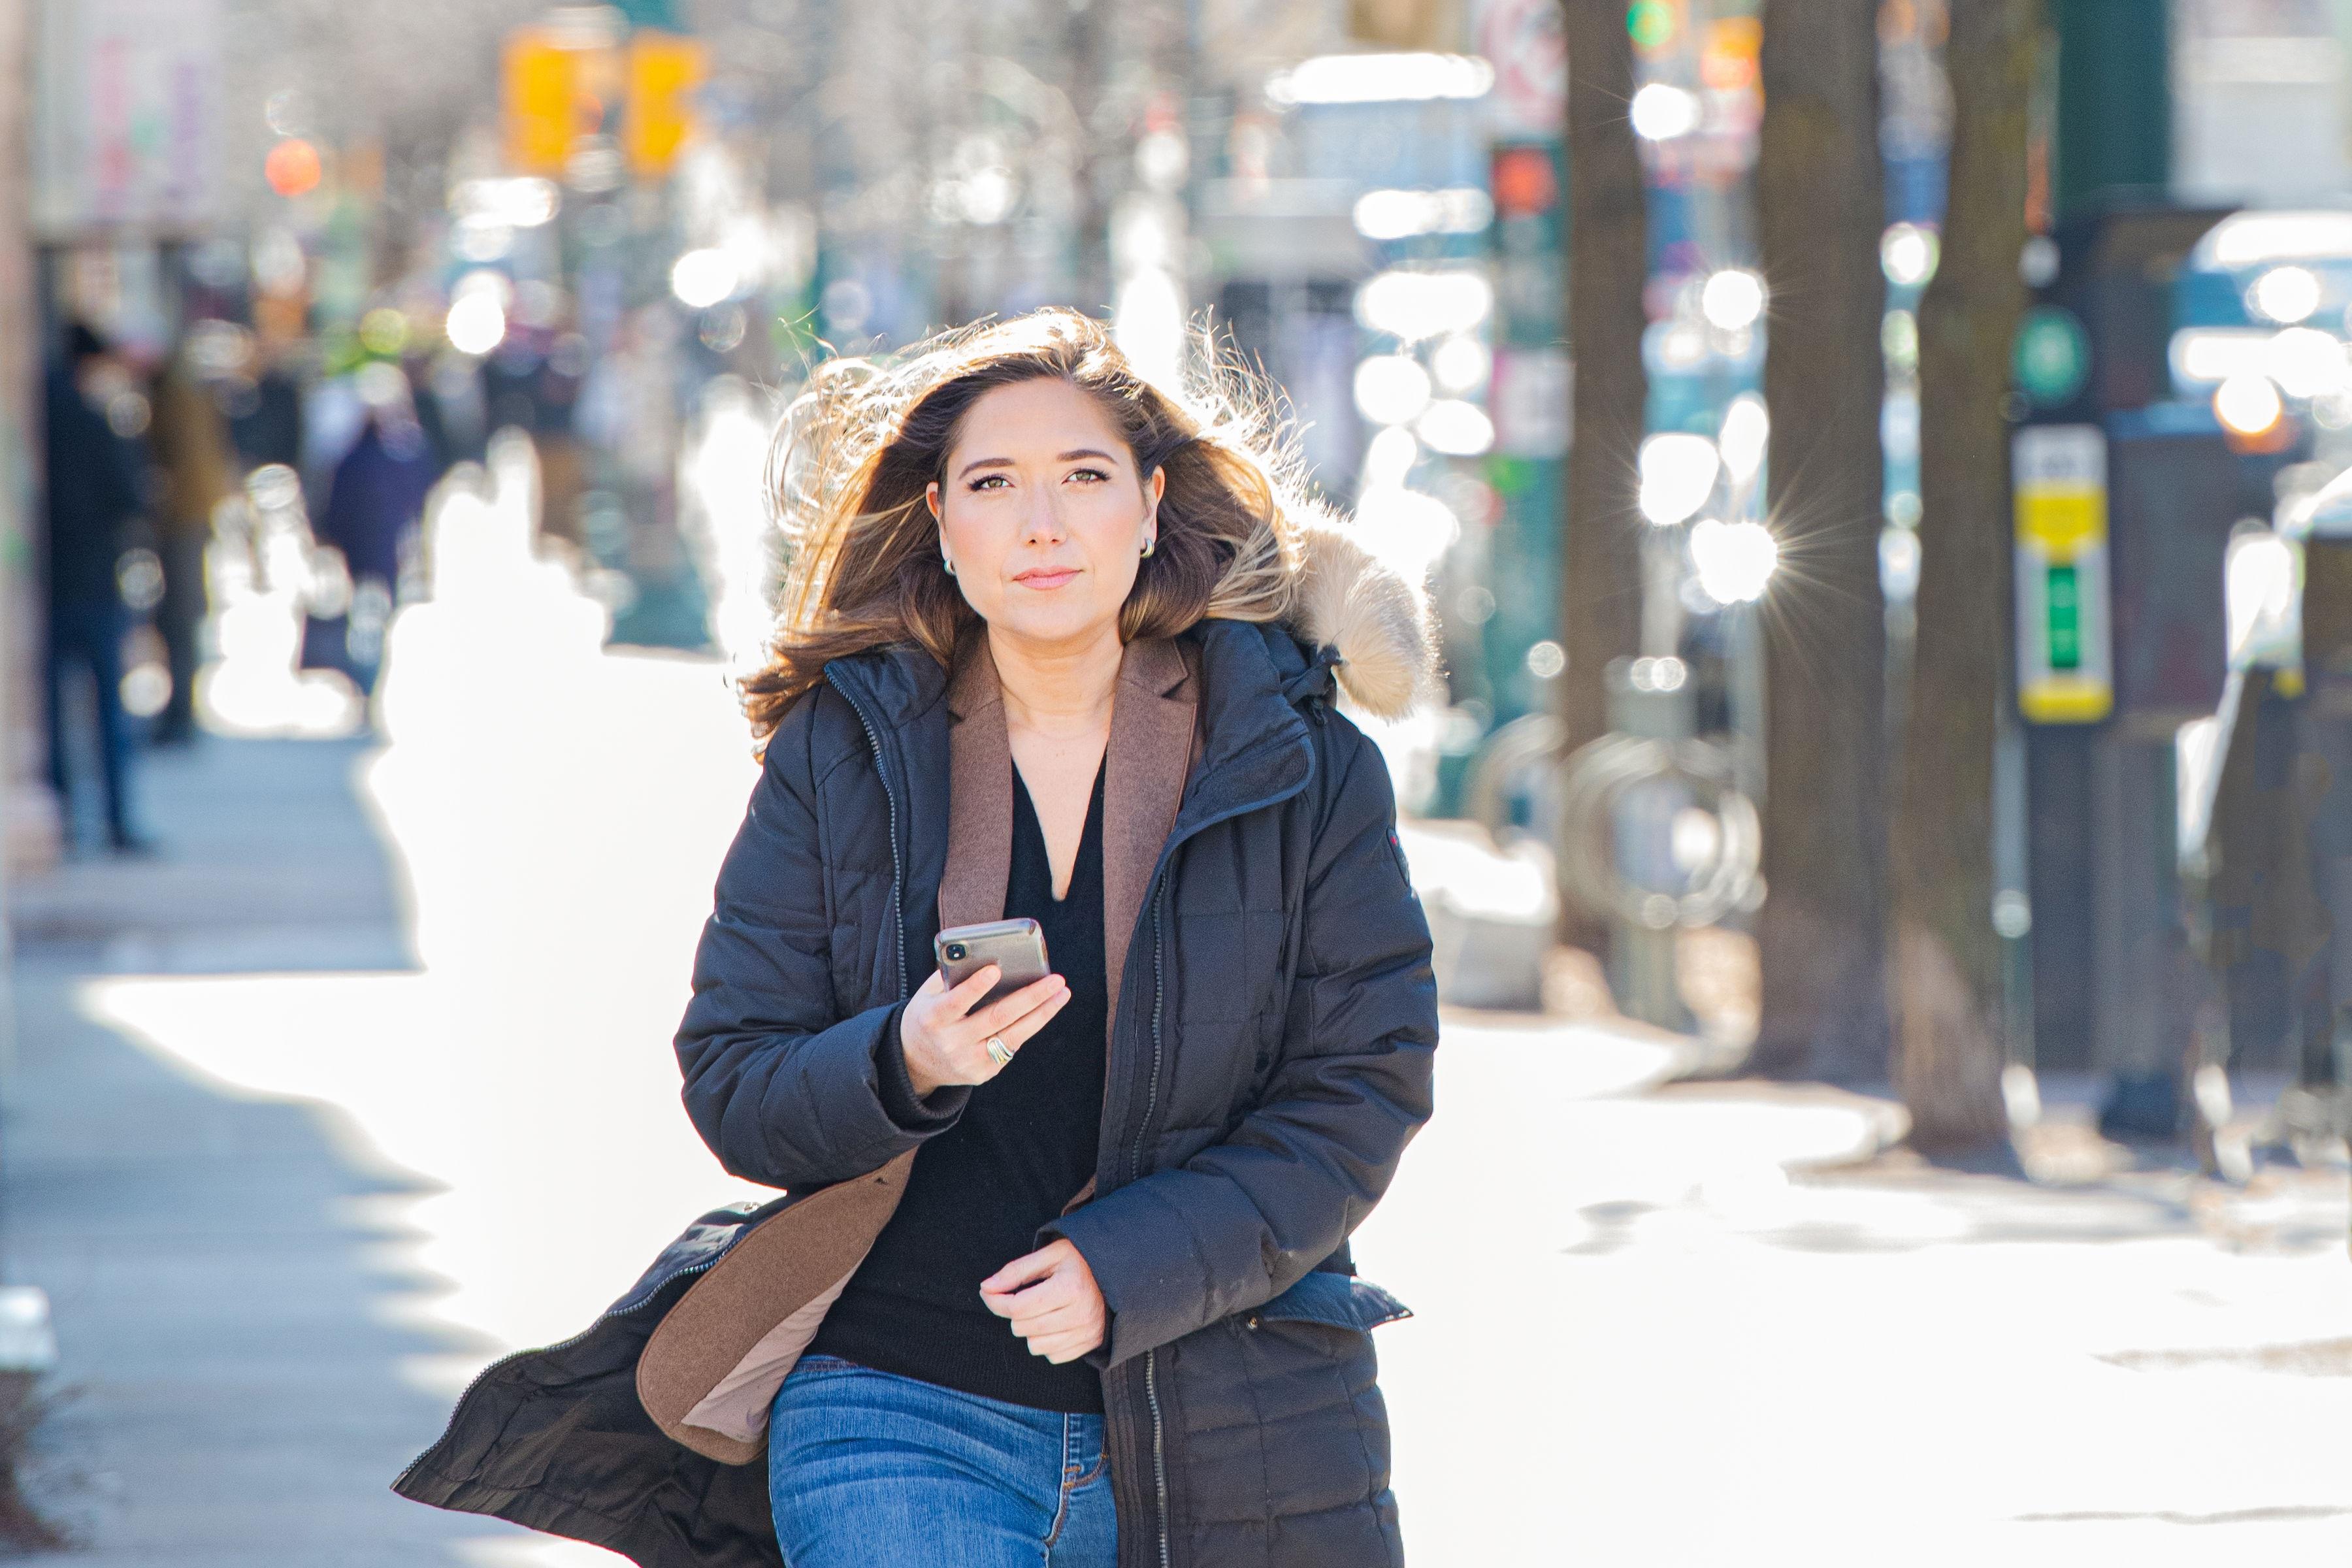 Selon Sarah Prevette, entrepreneure et investisseuse de Toronto